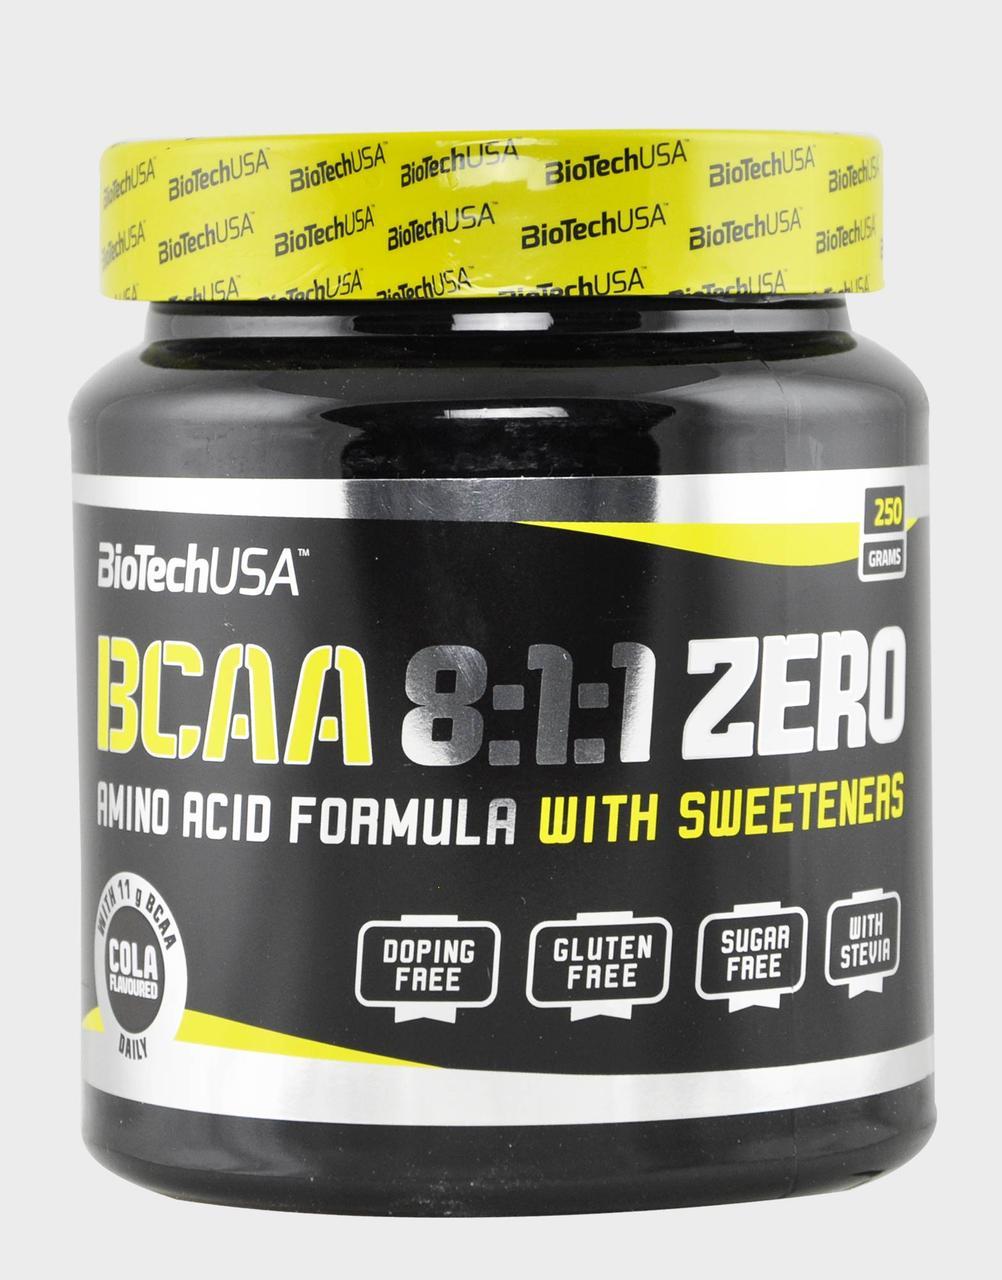 BioTech BCAA 8:1:1 ZERO 250 g, Биотеч БЦА 8:1:1 250 грамм